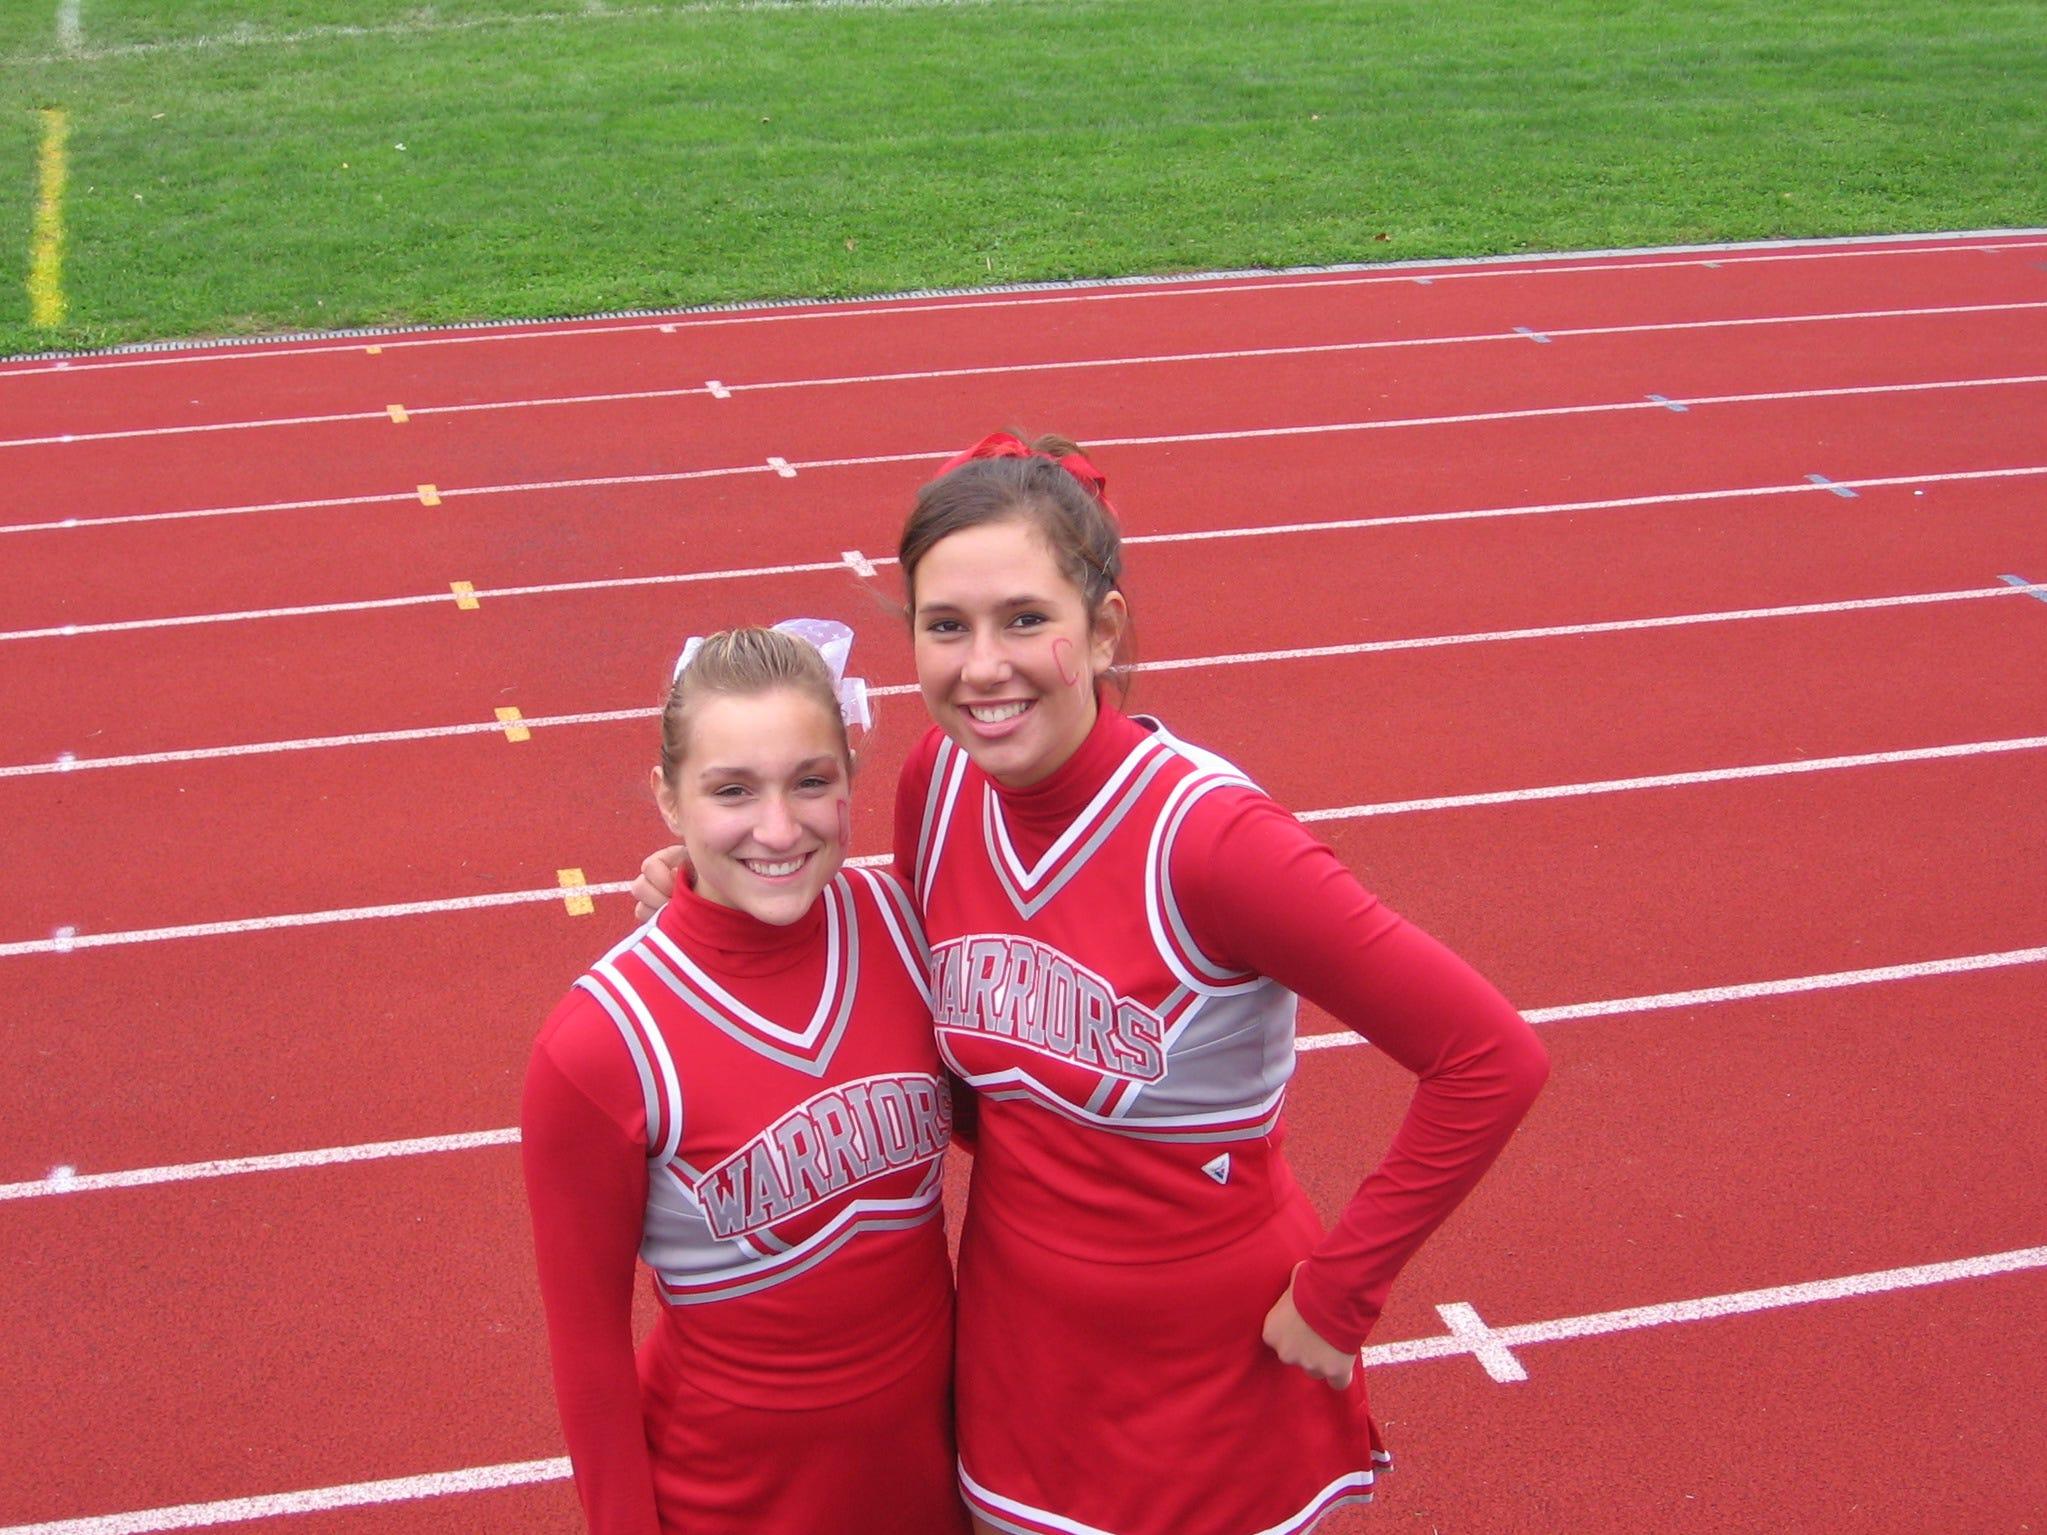 Chenango Valley cheerleaders Sarah Laymans and Sarah Konop.